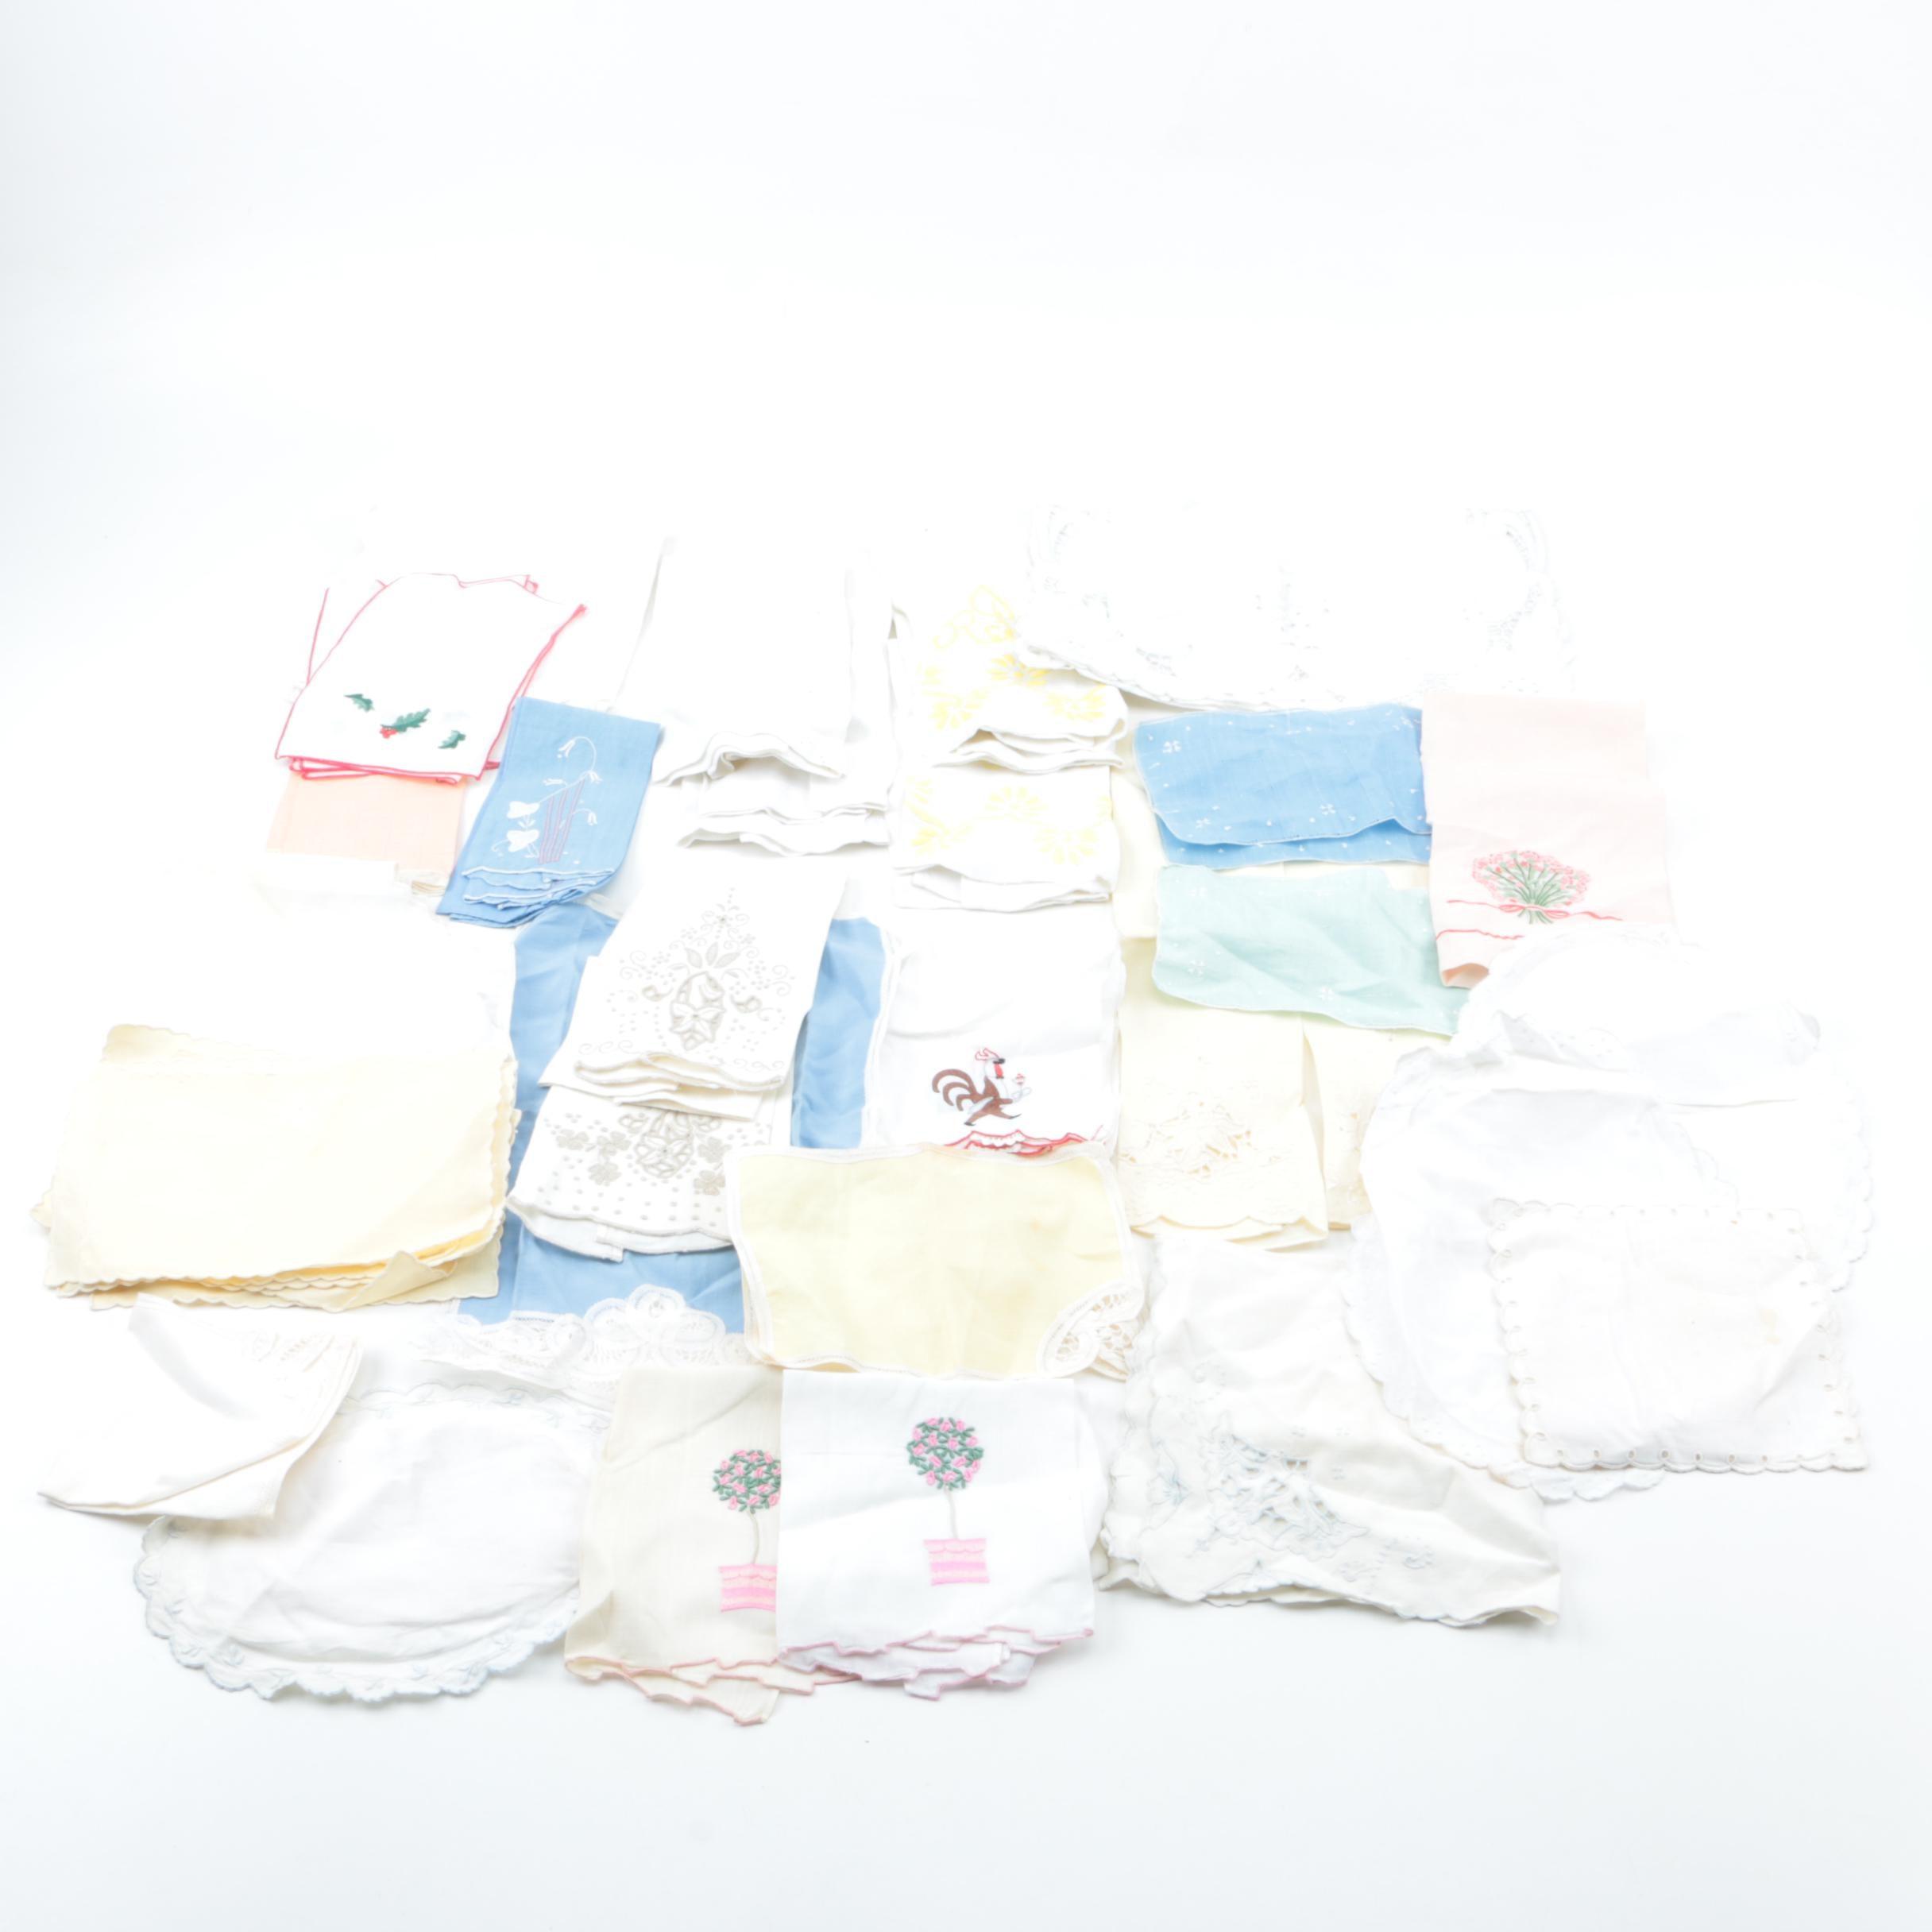 Vintage Embroidered Napkin Assortment